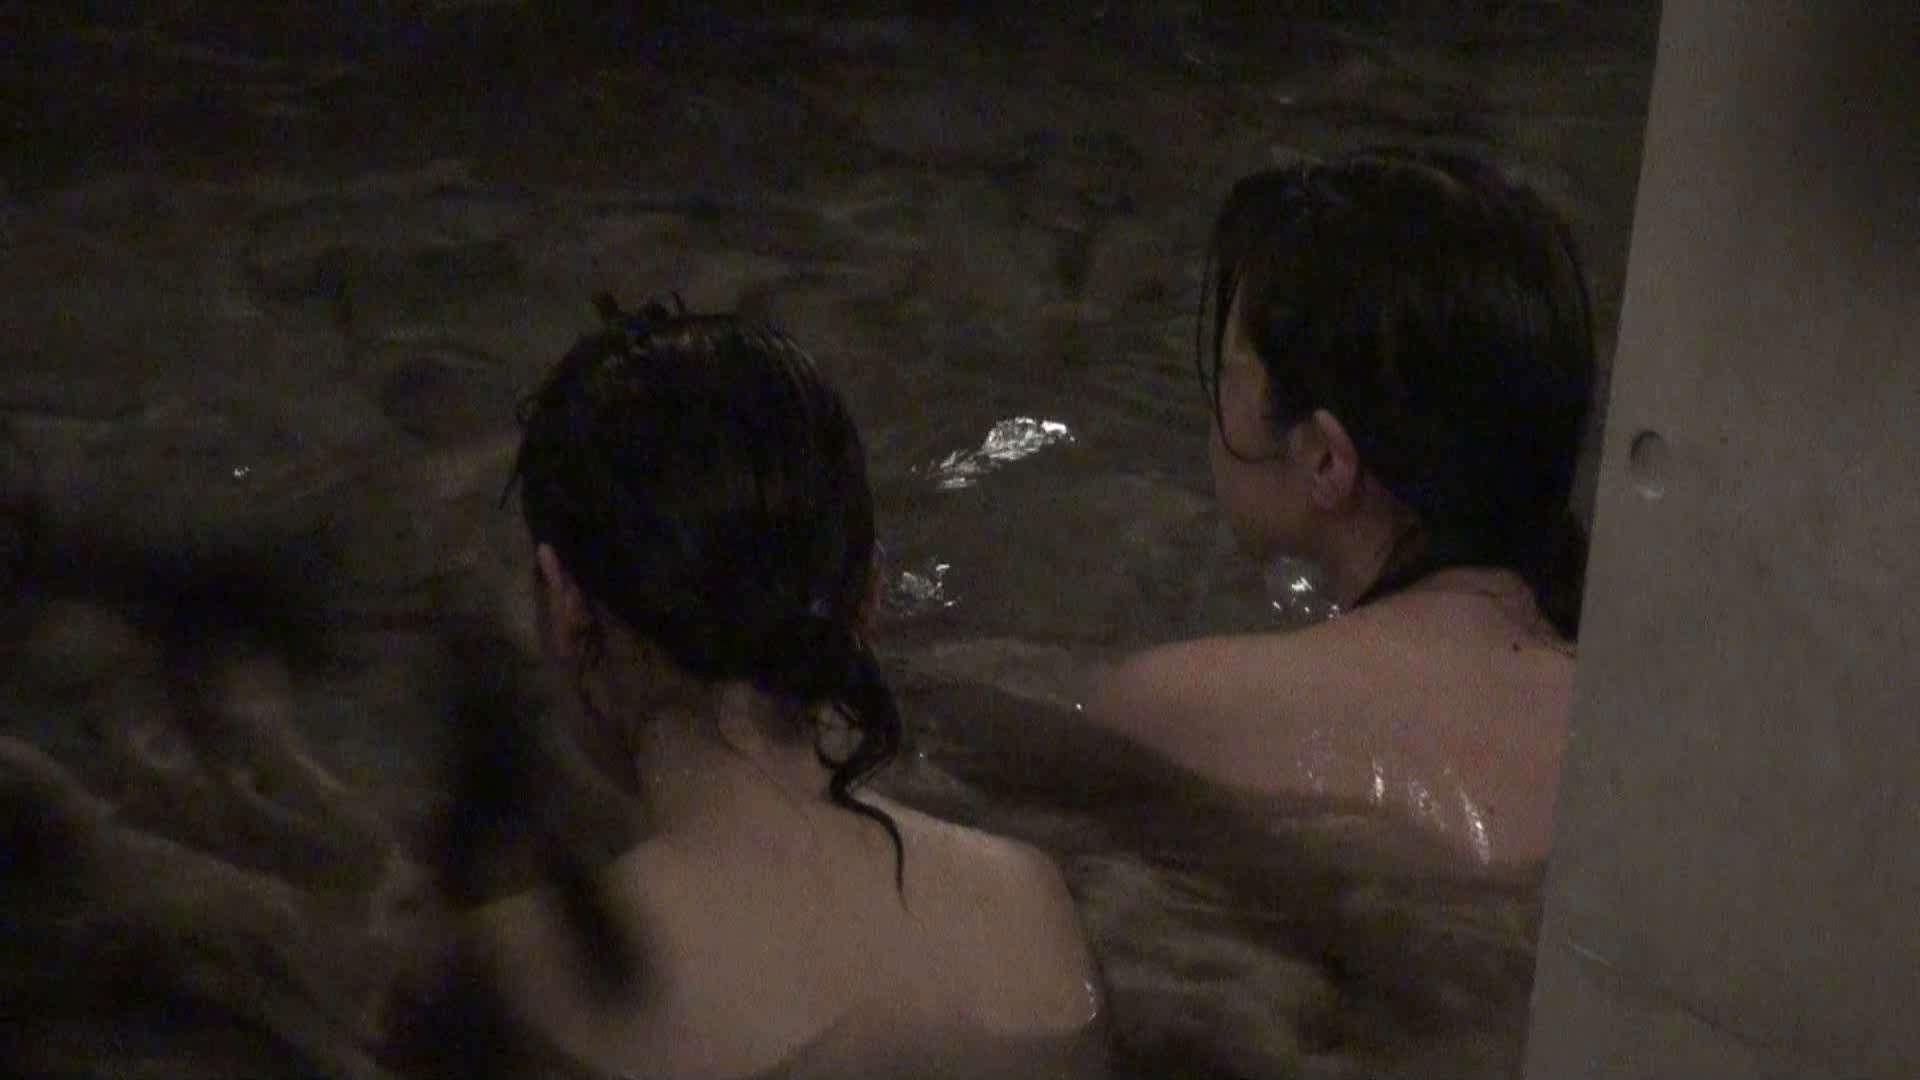 Aquaな露天風呂Vol.402 OLセックス   露天  88画像 37